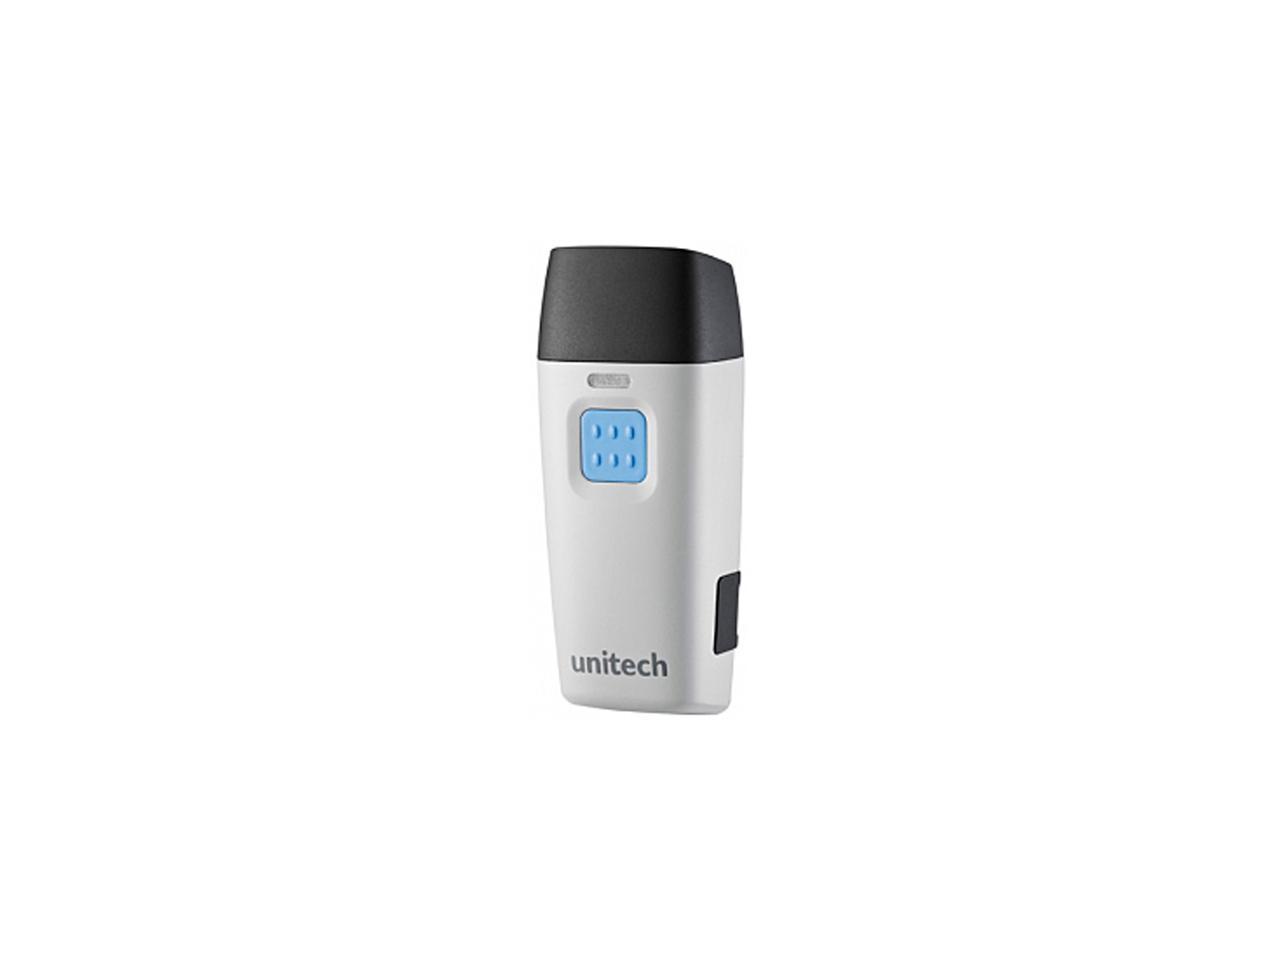 MS912-KUBB00-TG USB Bluetooth Companion 1D Scanner Unitech MS912